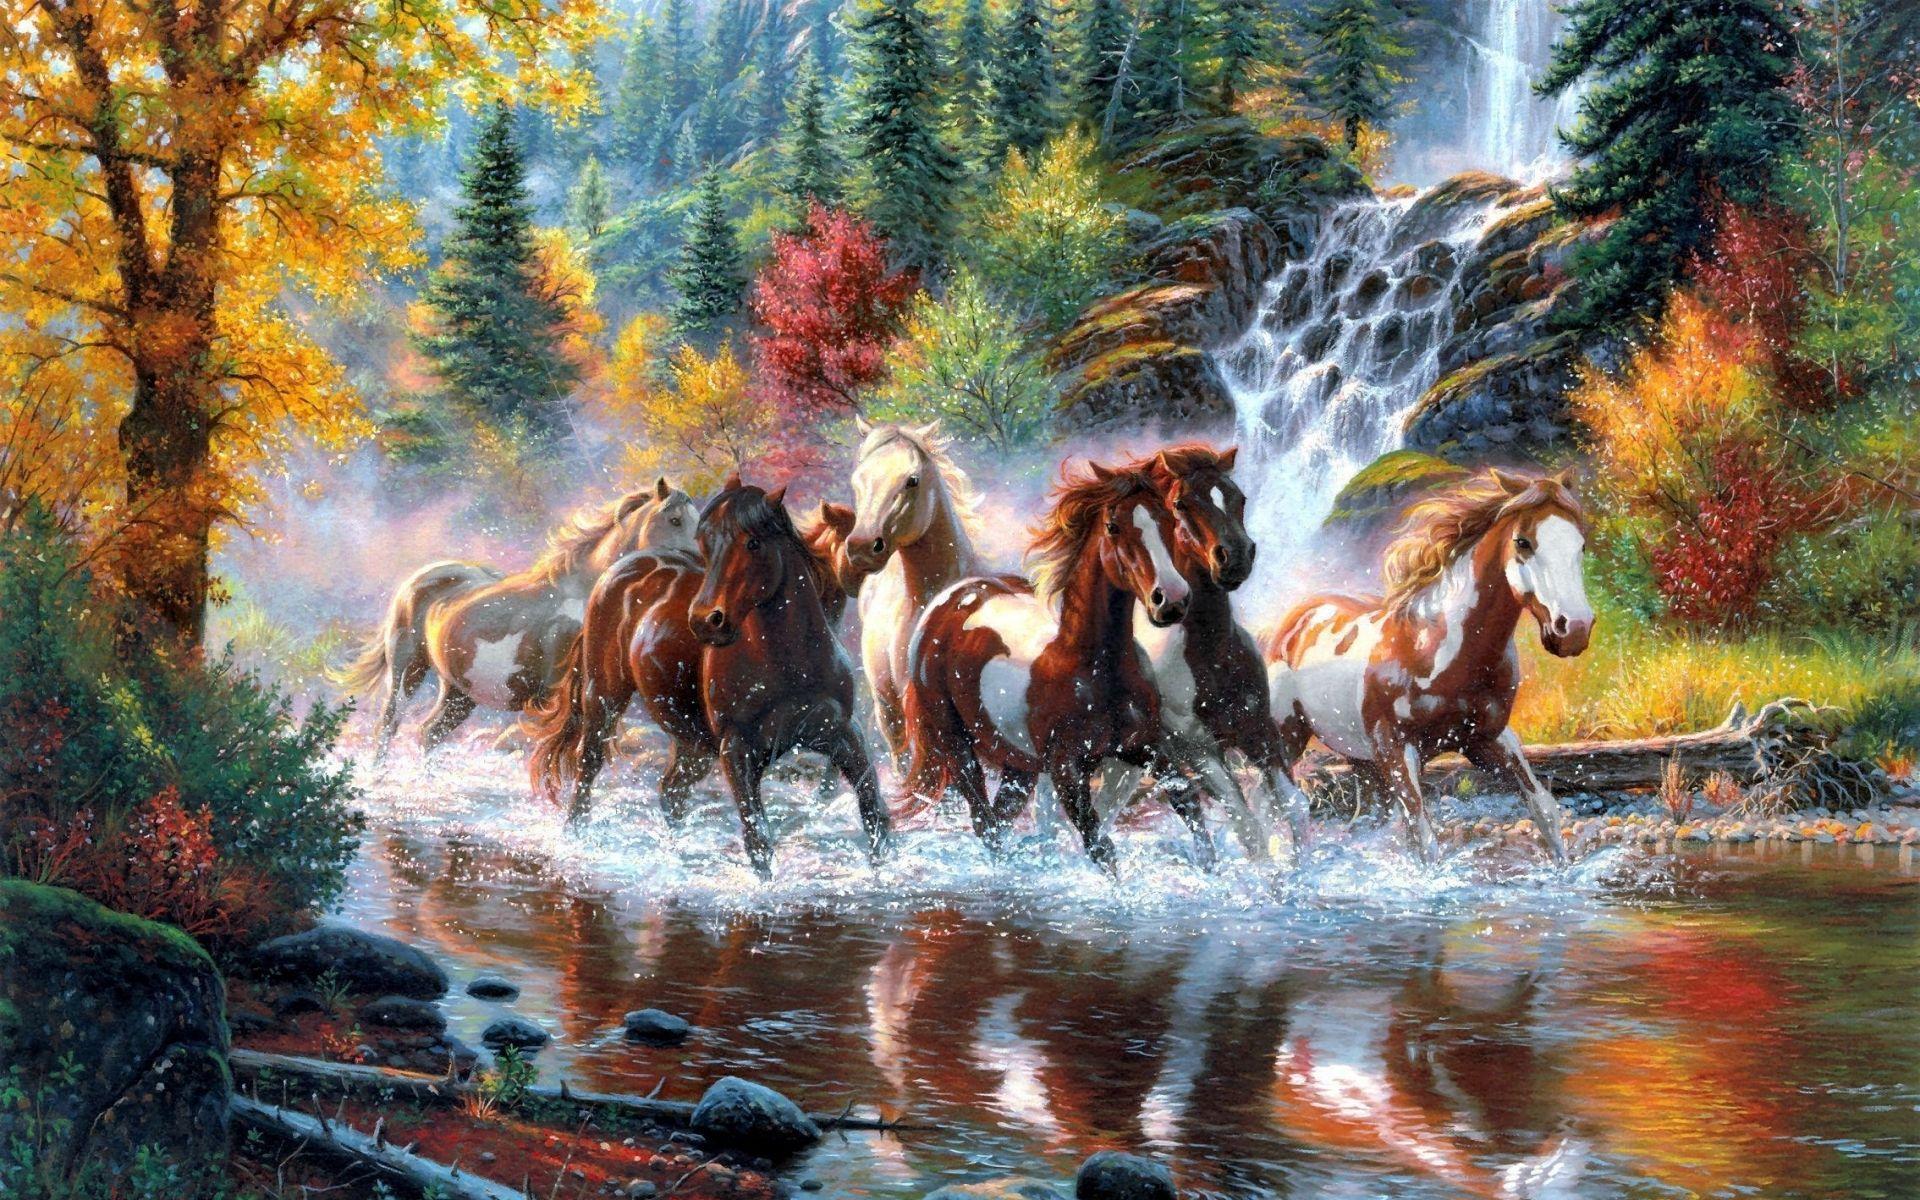 Animal Horse Artistic Artist Illustration Scenic